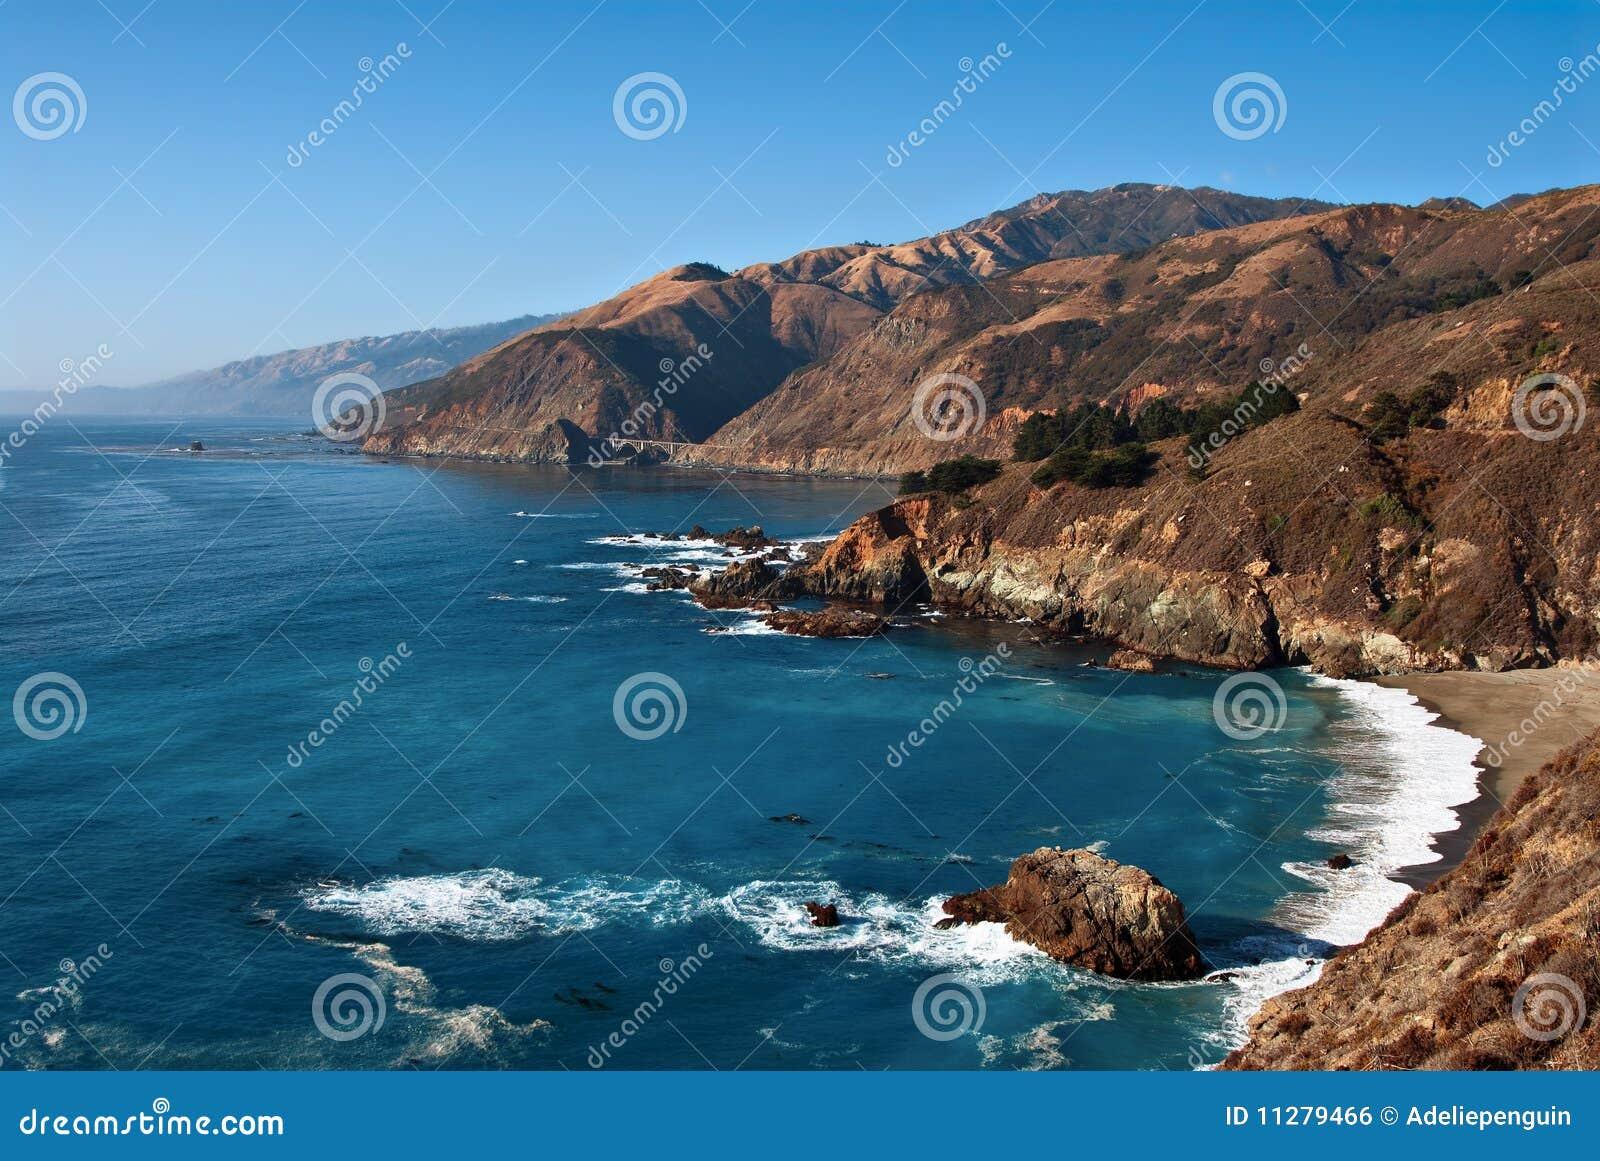 Big Sur, California Coast